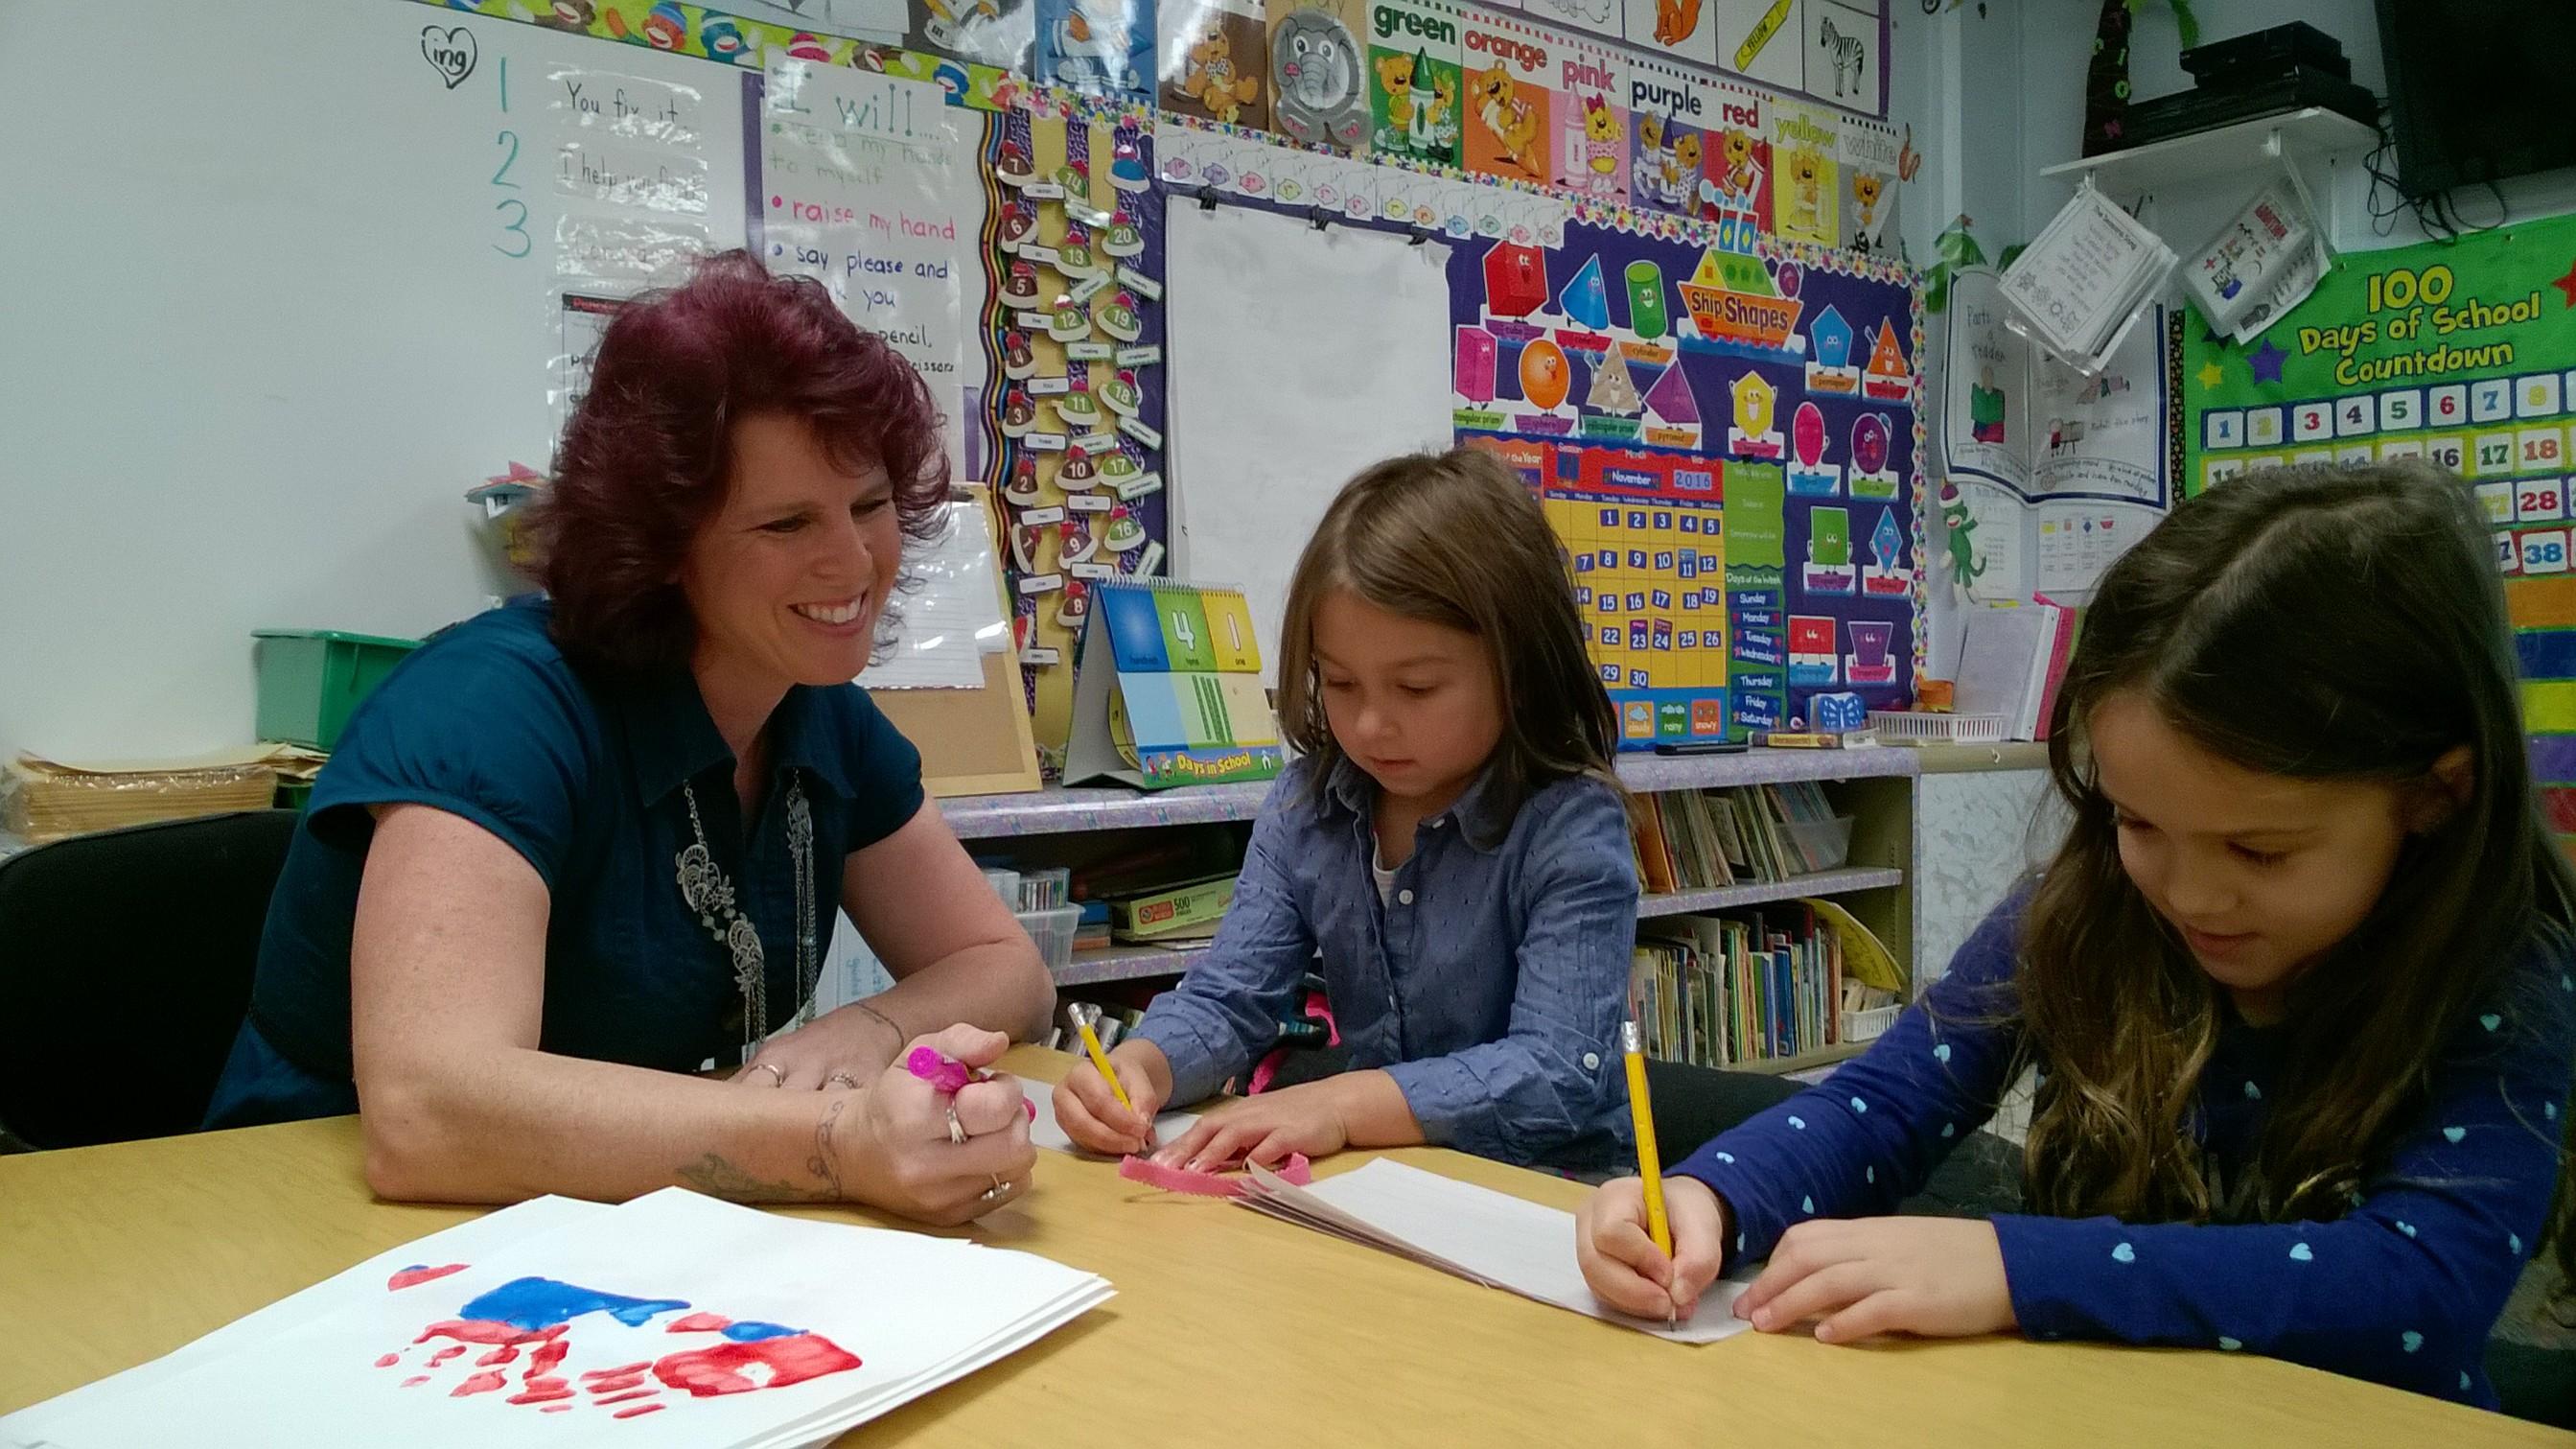 Royalton-Hartland Elementary School teacher Heather Pedini with two students, Taegan Stern and Sabrina Maline. (Provided photo)